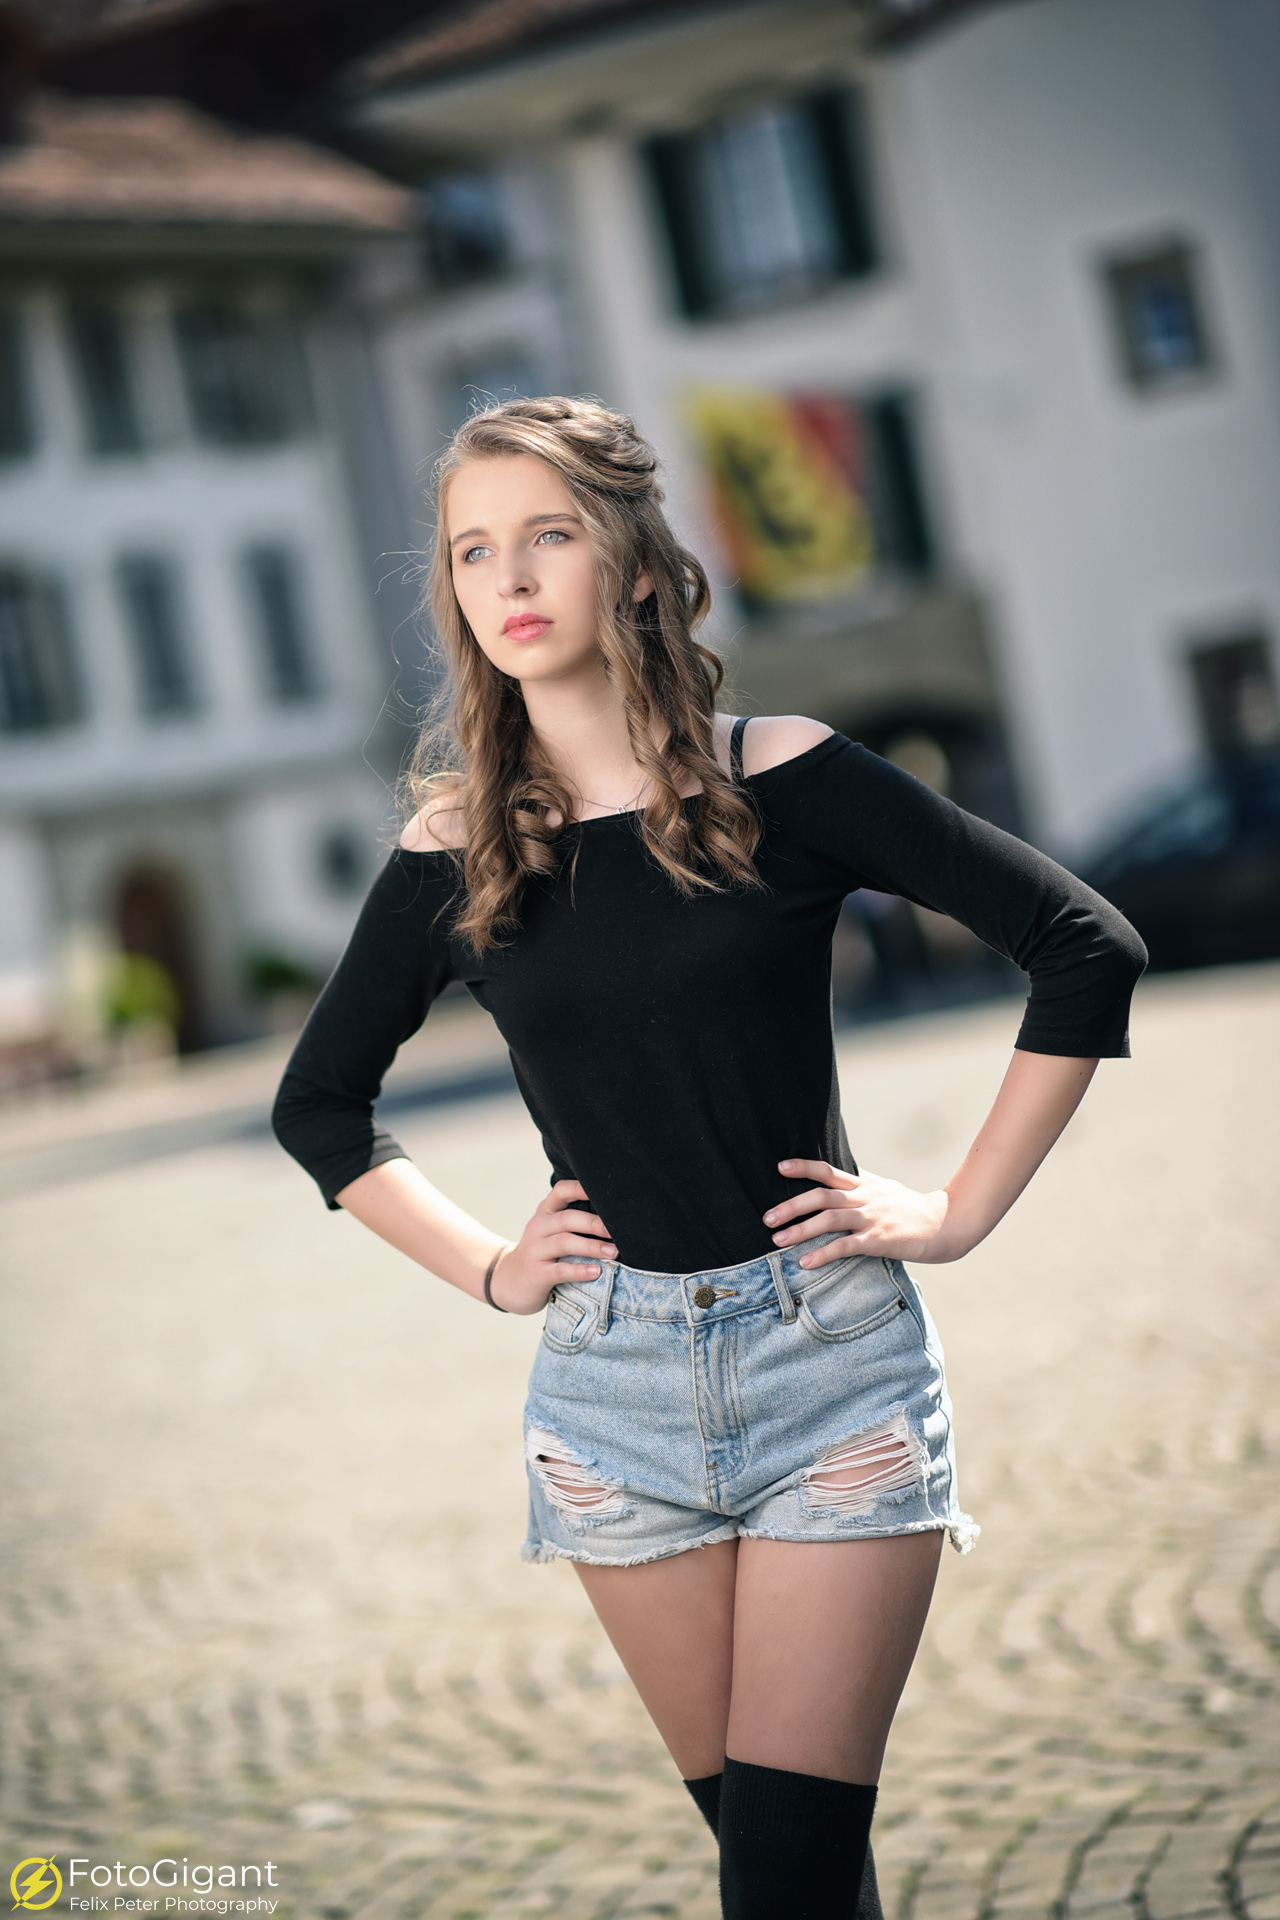 Portraitfotograf_Bern_04.jpg